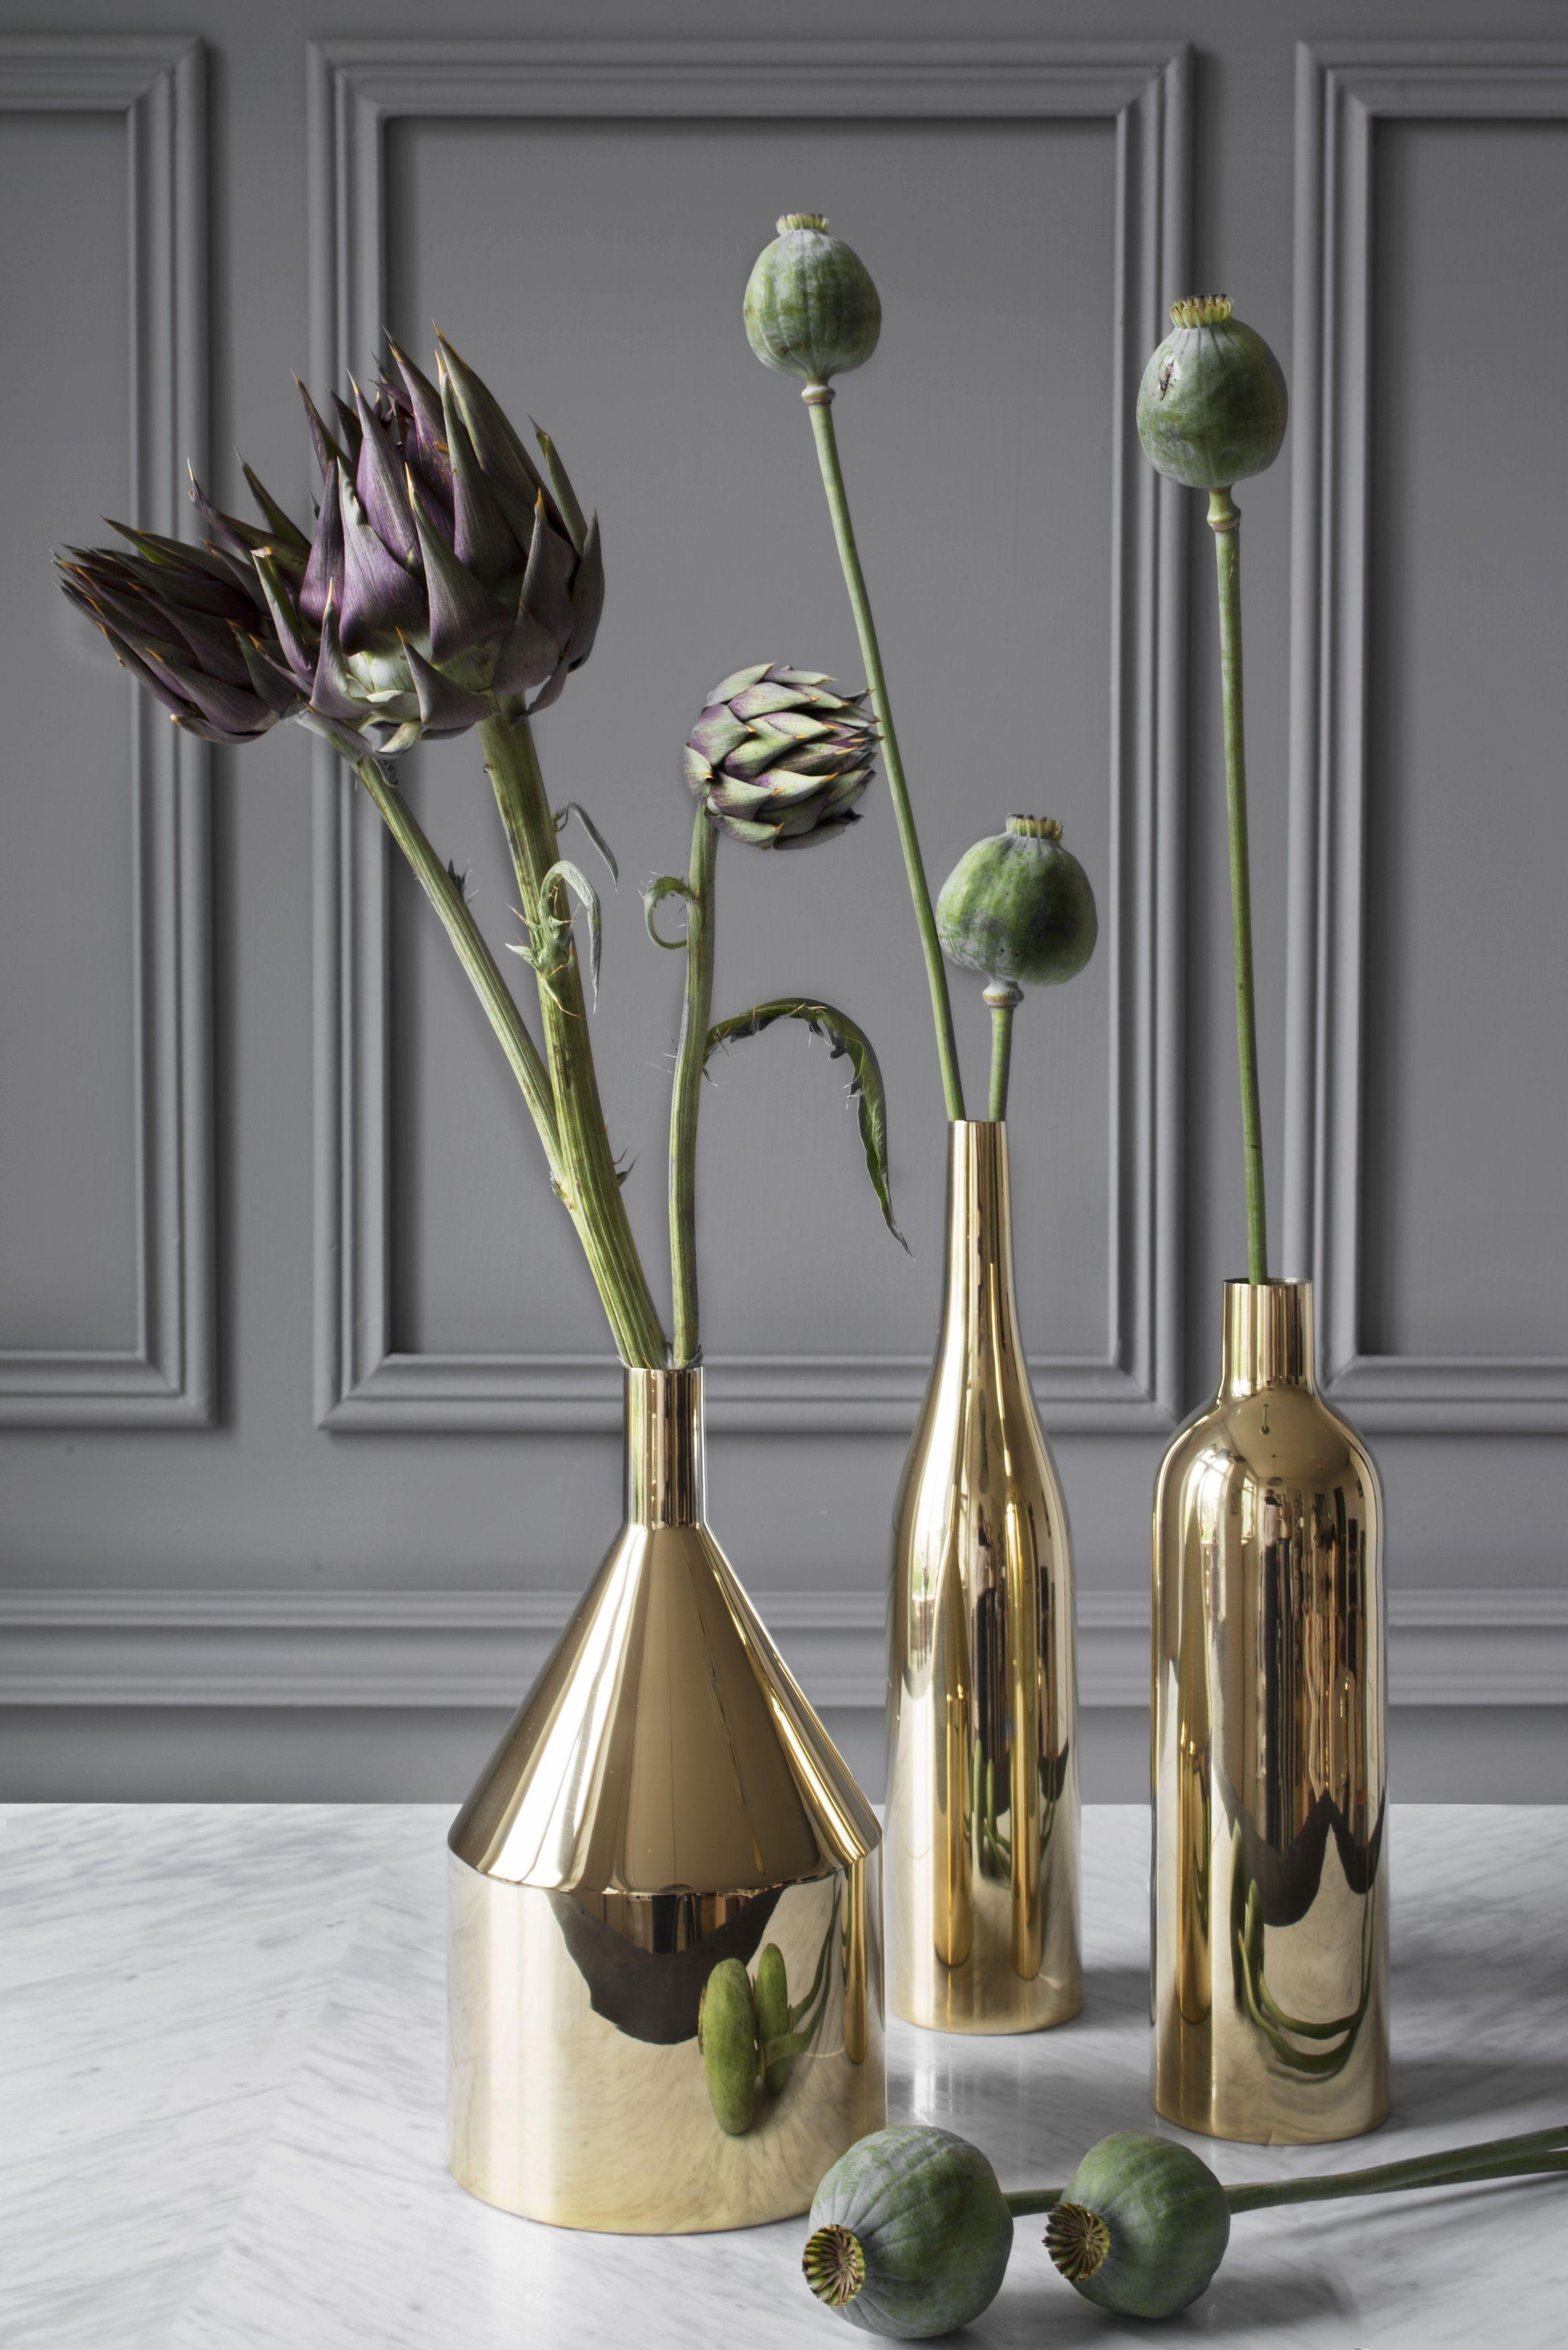 Skultuna vase via fondazza model c interiors modern victorian skultuna vase via fondazza model c grey interior designpurple floridaeventfo Image collections